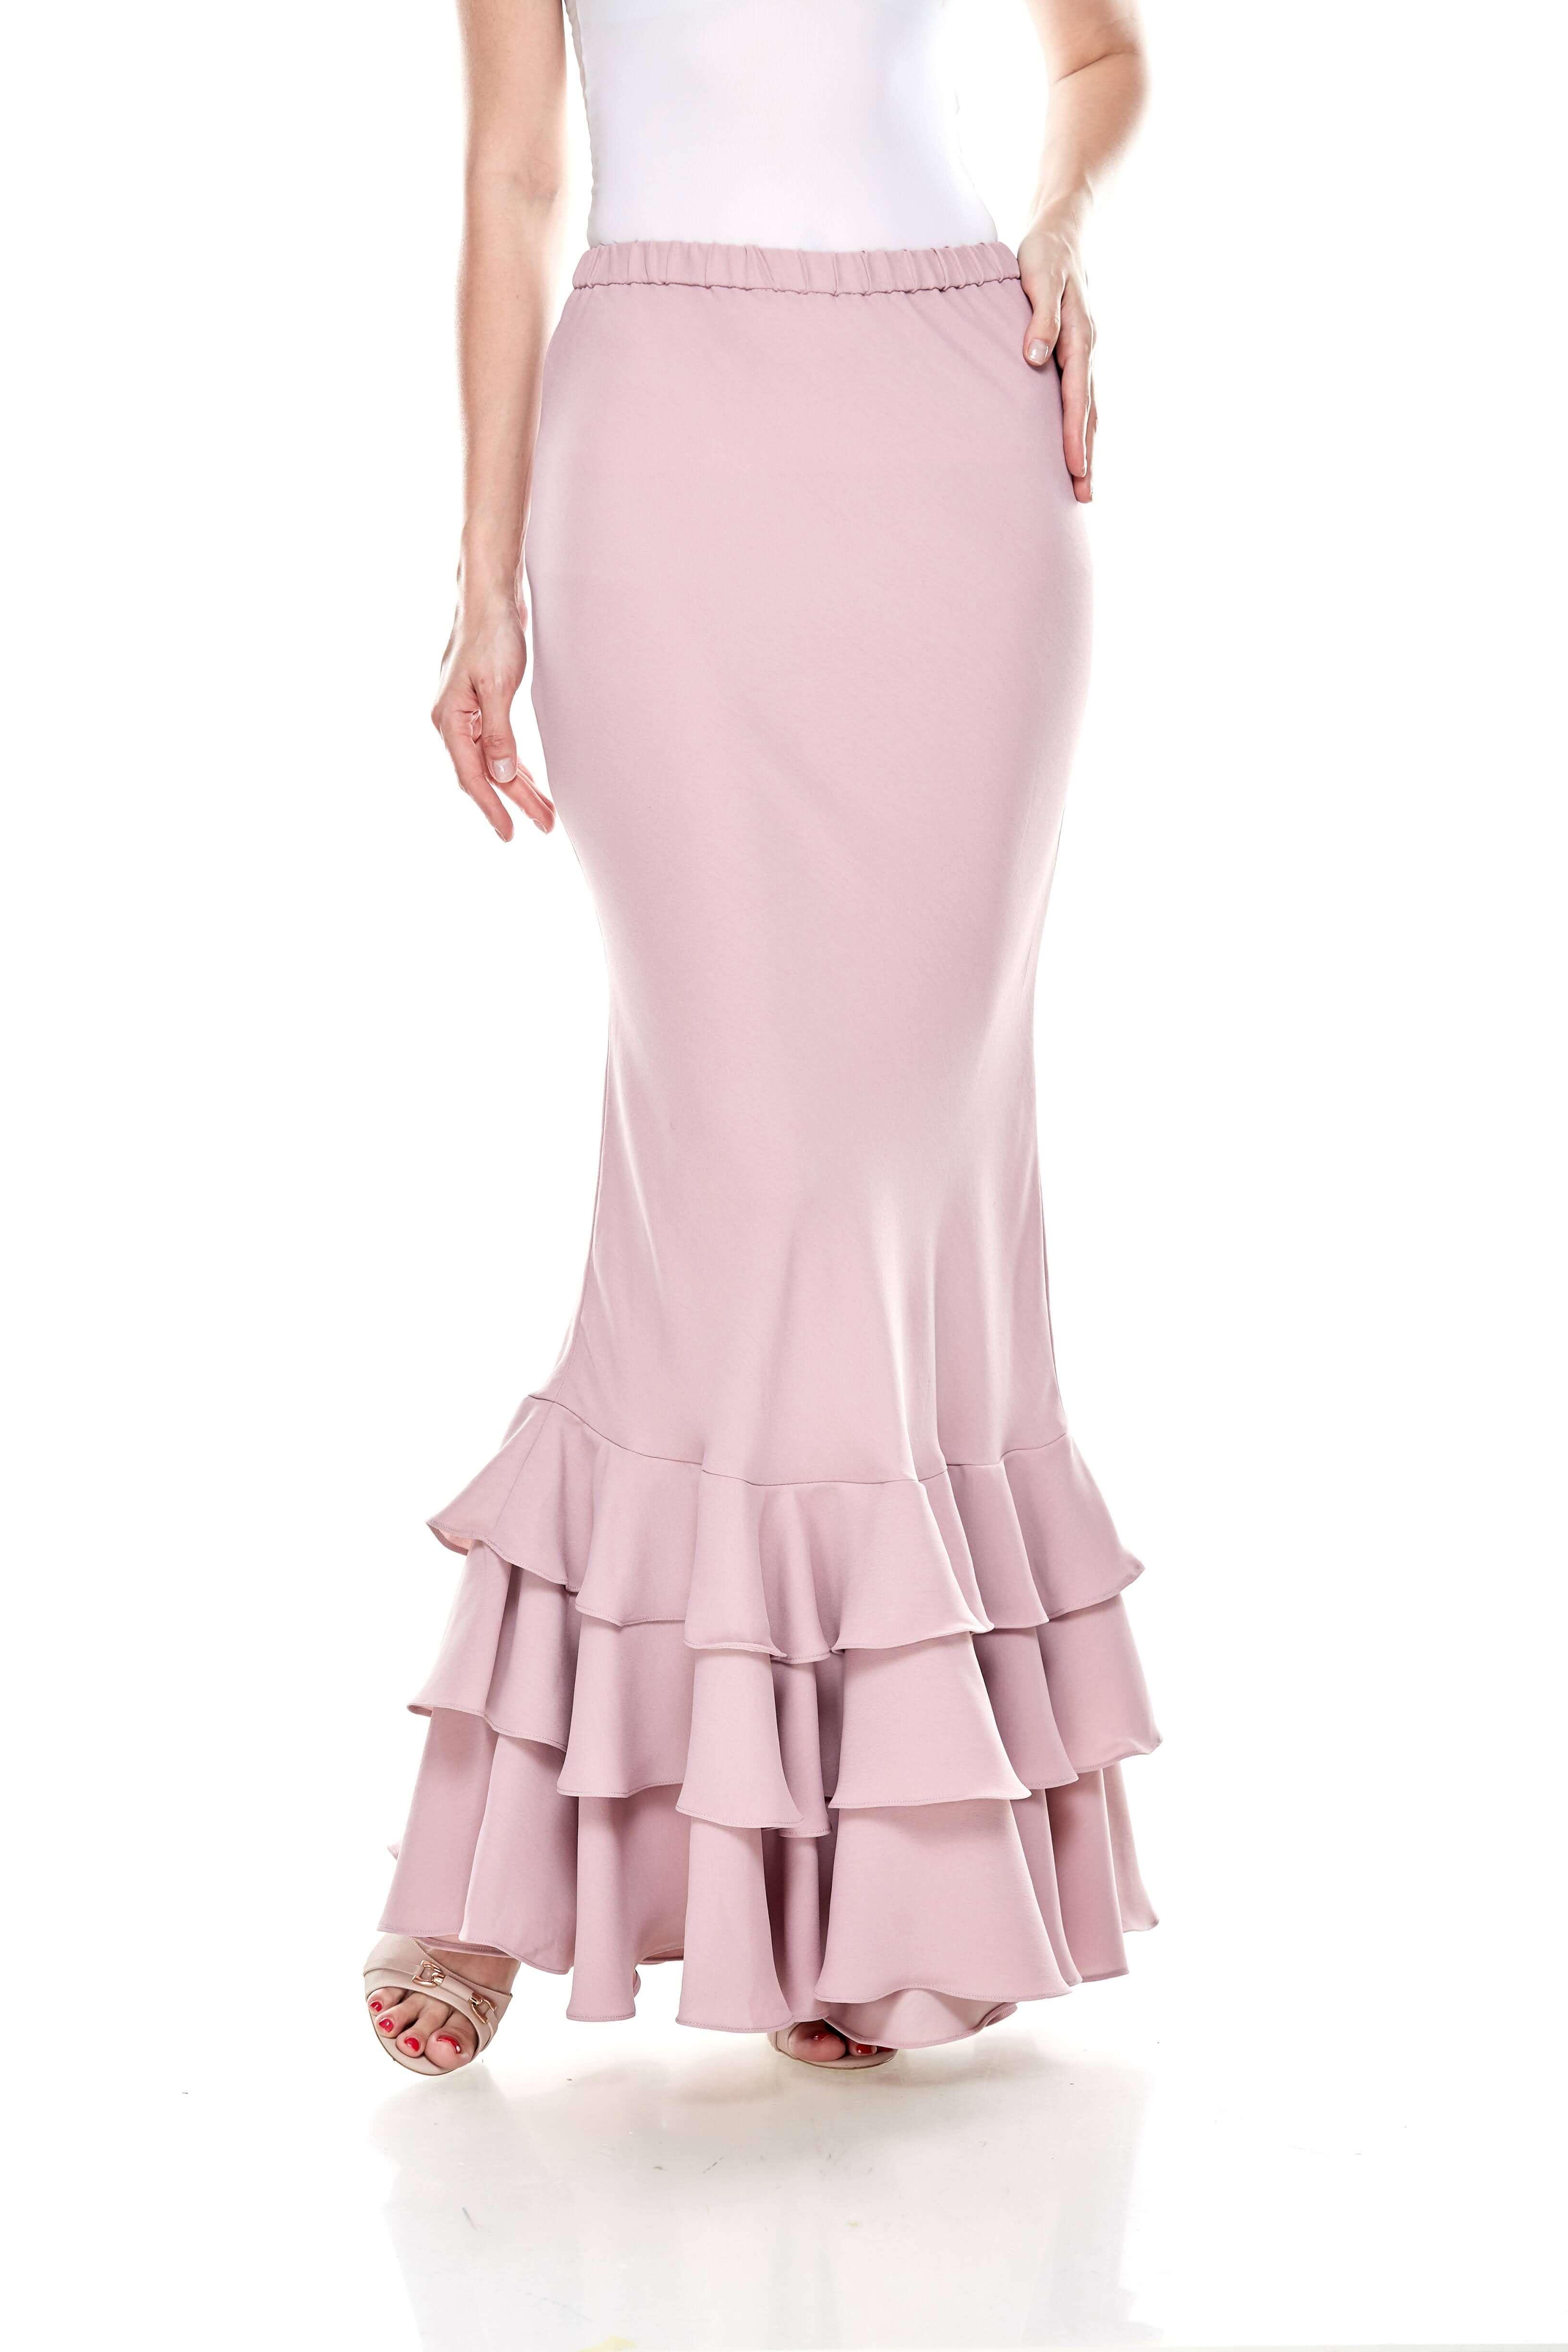 Rose Dawn Pink Ruffle Skirt